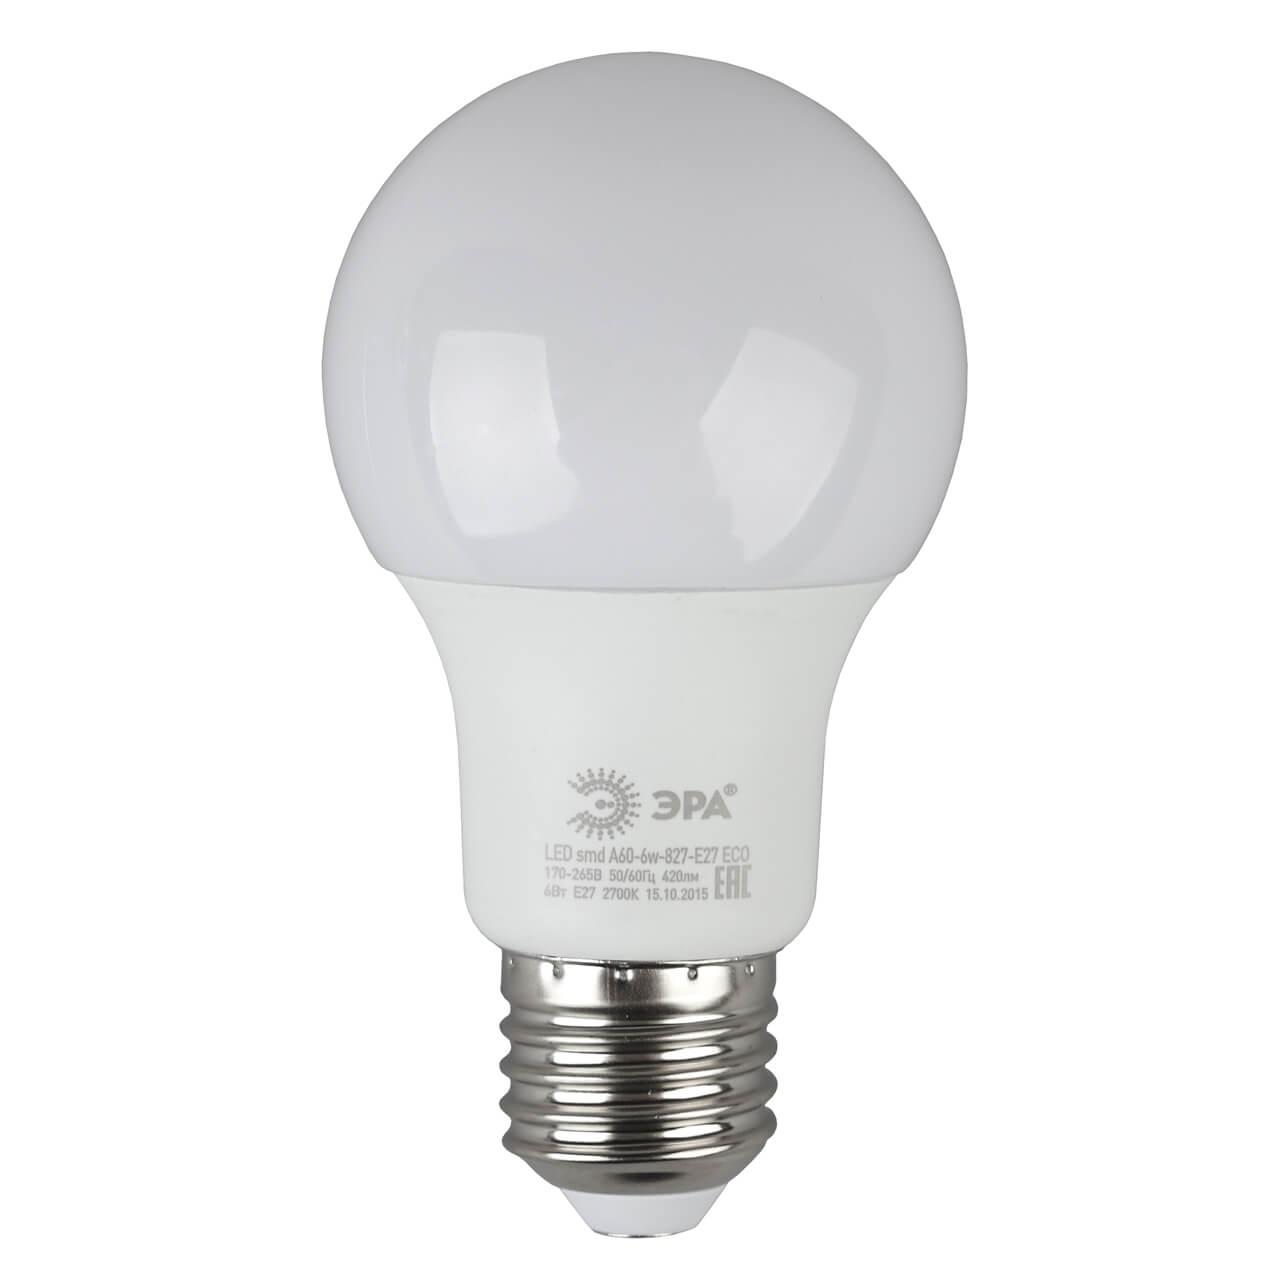 Лампа светодиодная ЭРА E27 6W 2700K матовая ECO LED A60-6W-827-E27 лампа светодиодная e27 6w 2700k свеча матовая le cd 6 e27 827 l252